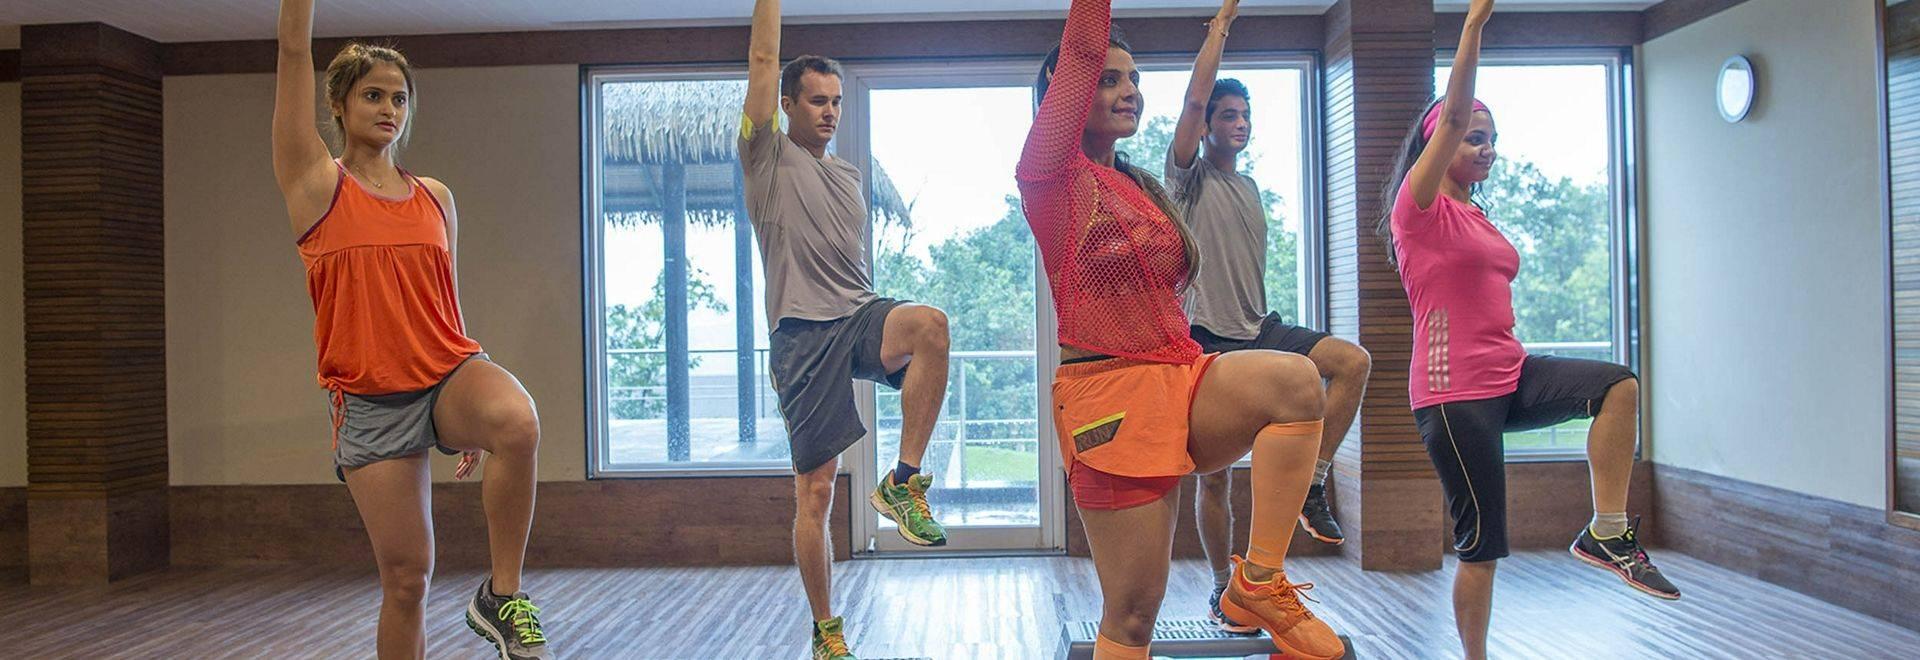 Atmantan-fitness-class.jpg